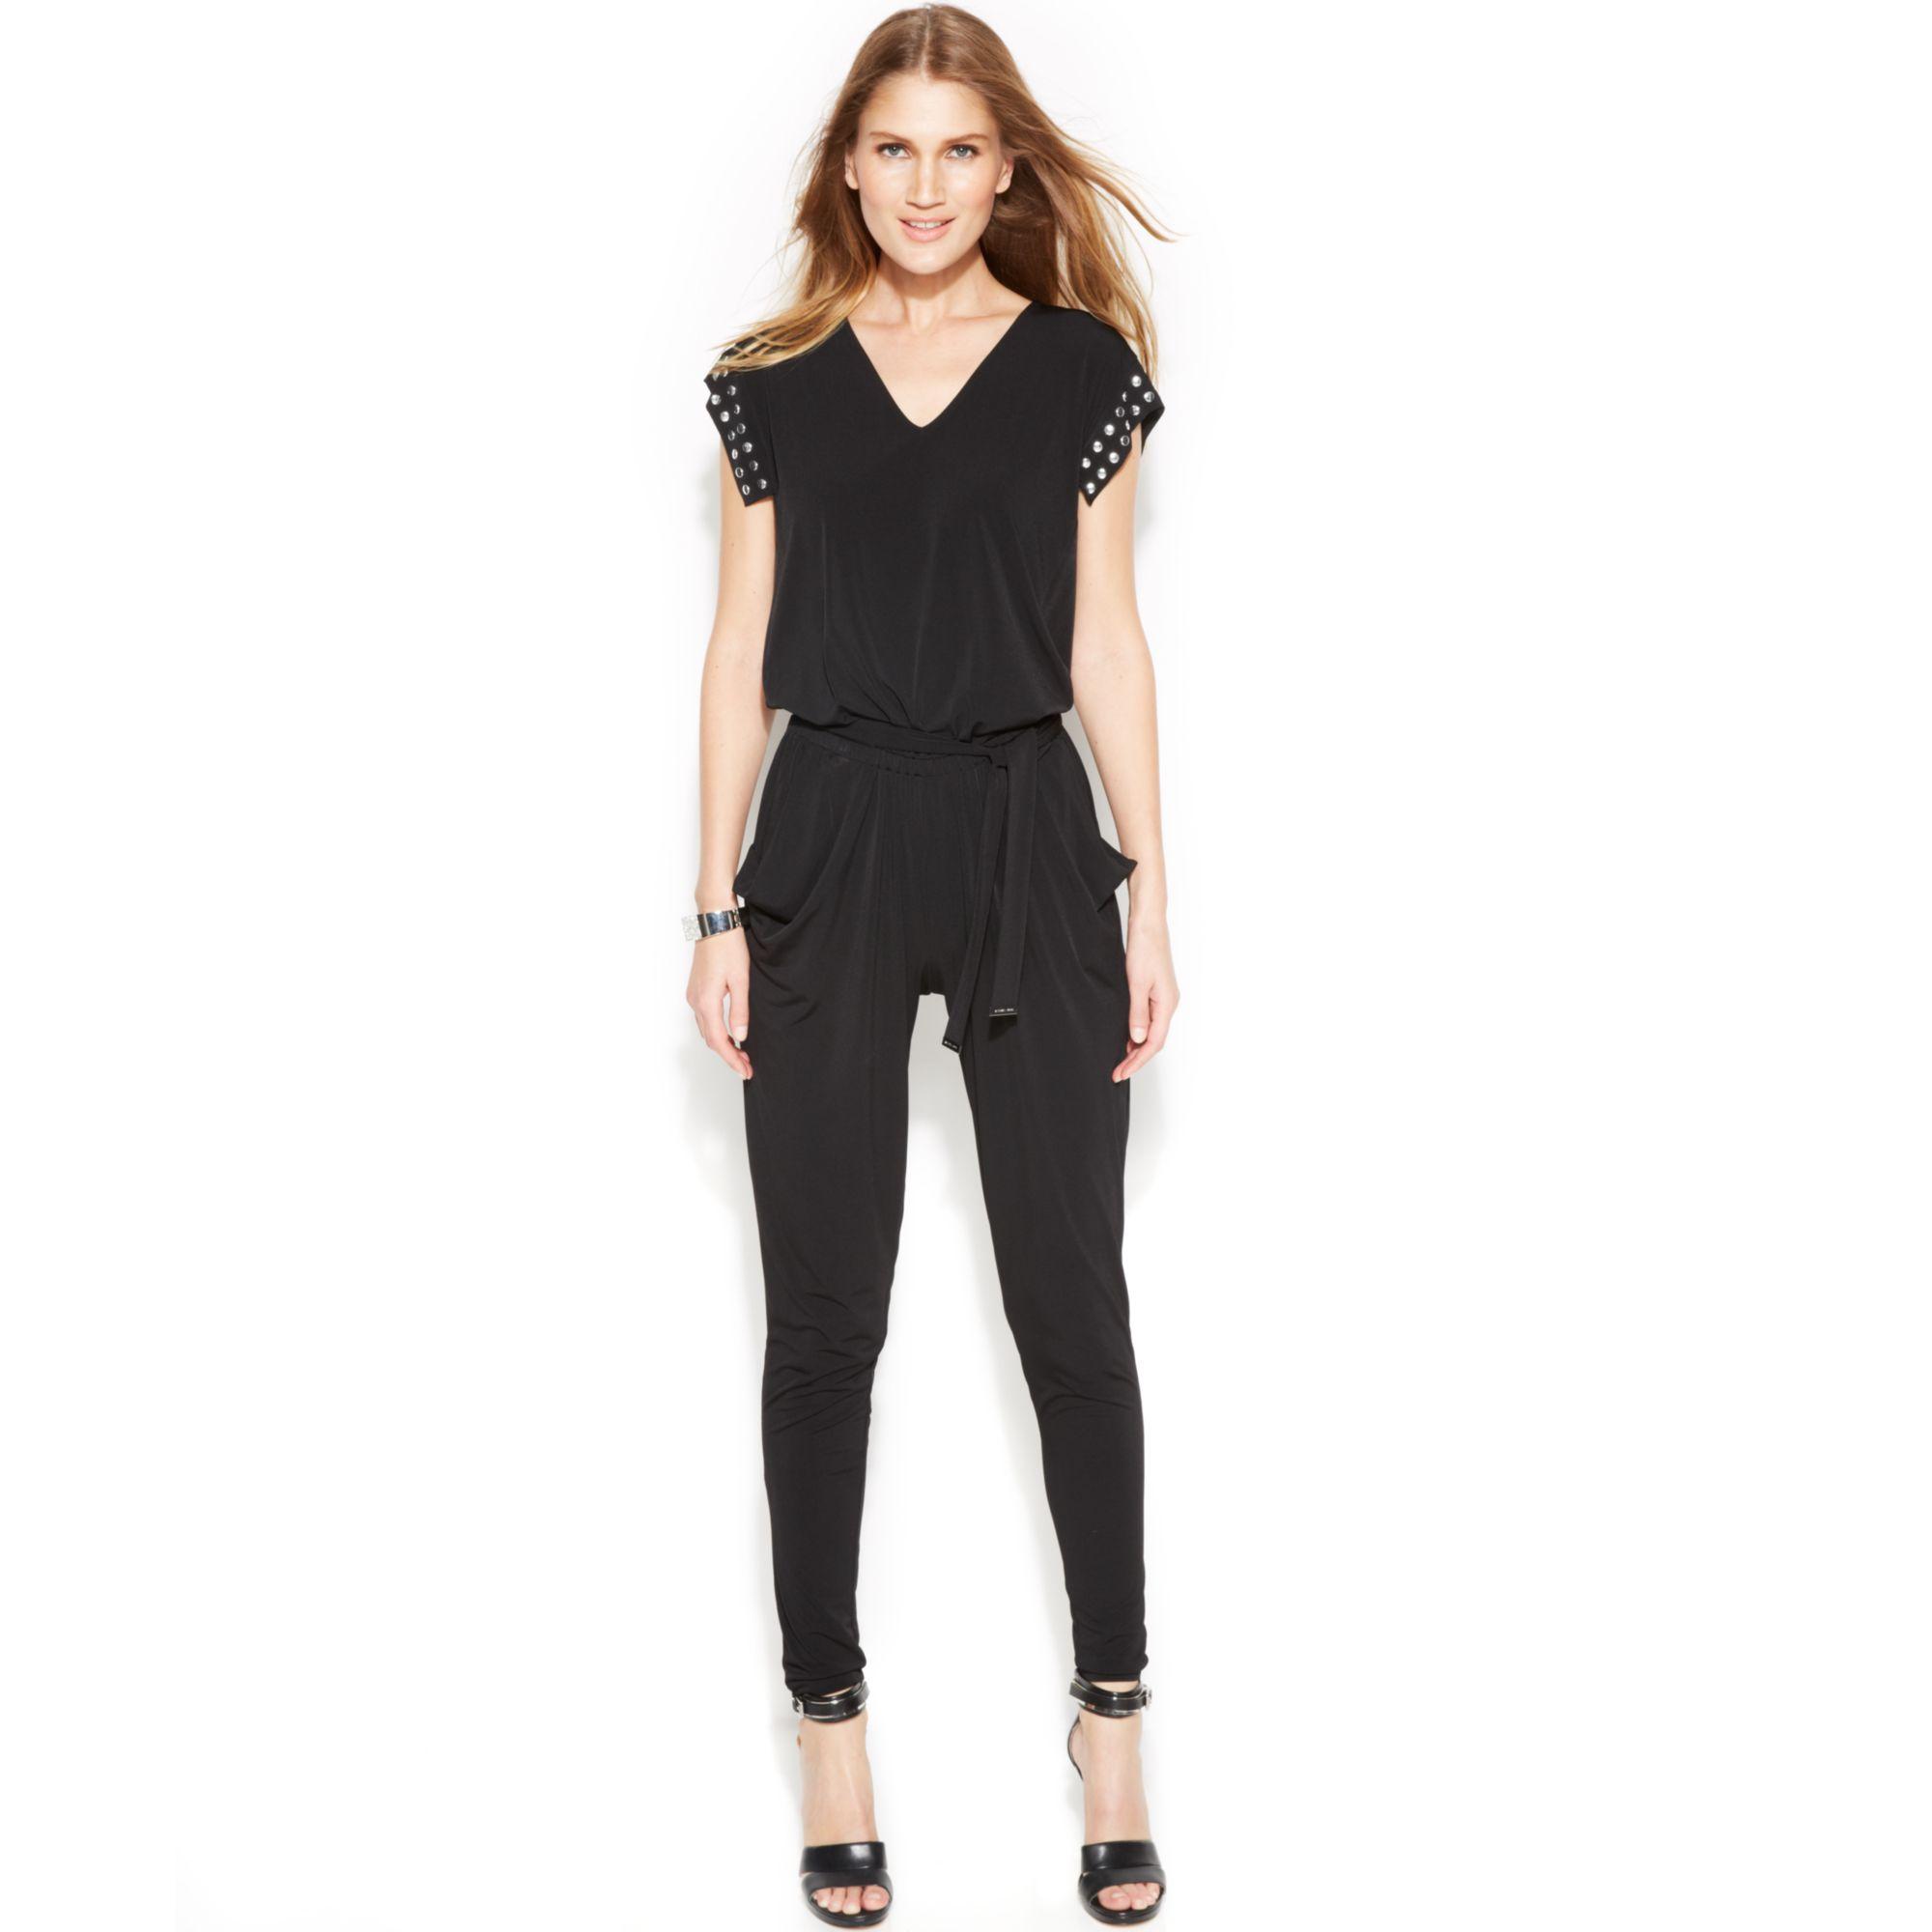 michael kors michael petite slimleg studded jumpsuit in black lyst. Black Bedroom Furniture Sets. Home Design Ideas